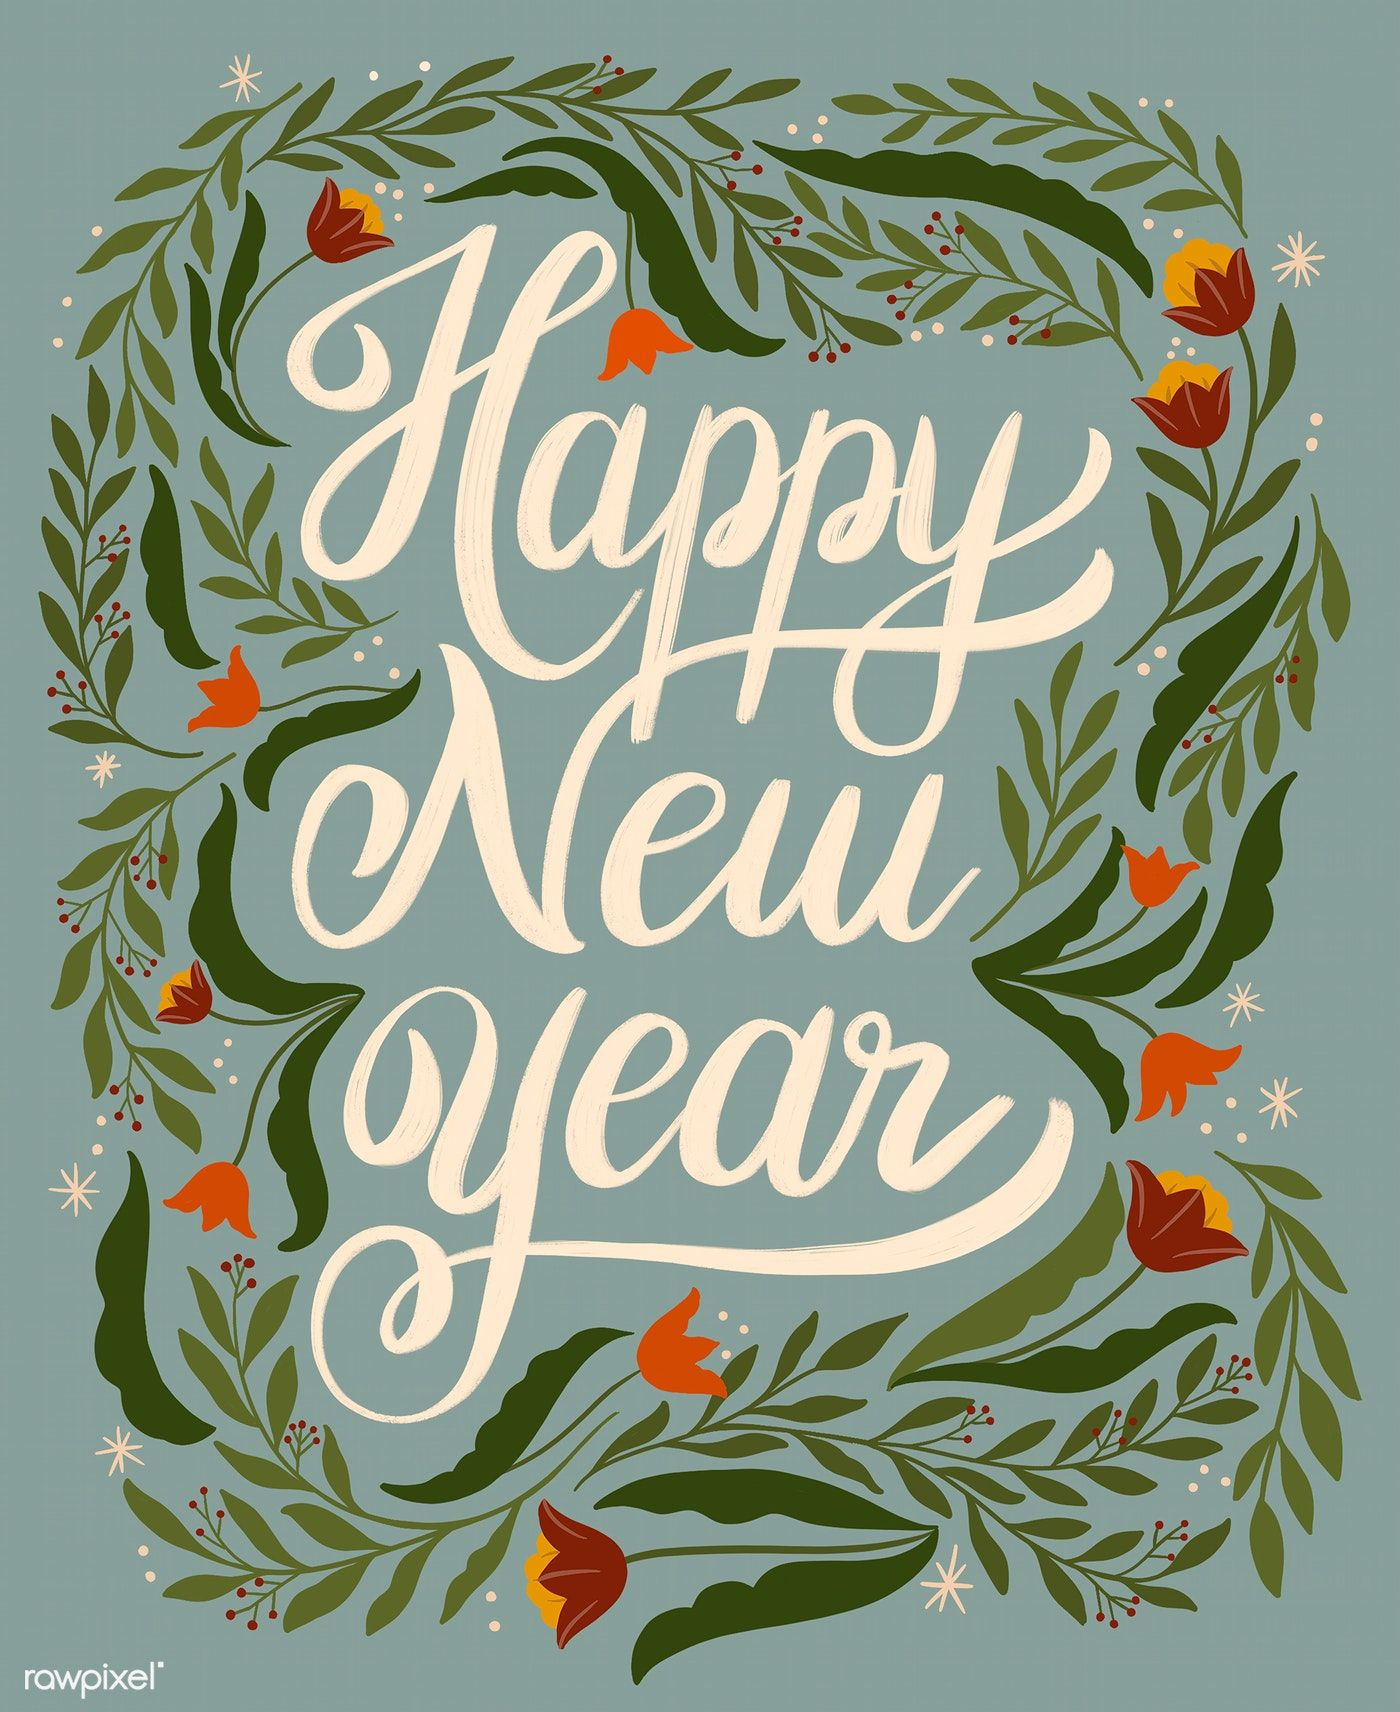 Download premium illustration of Happy new year greeting